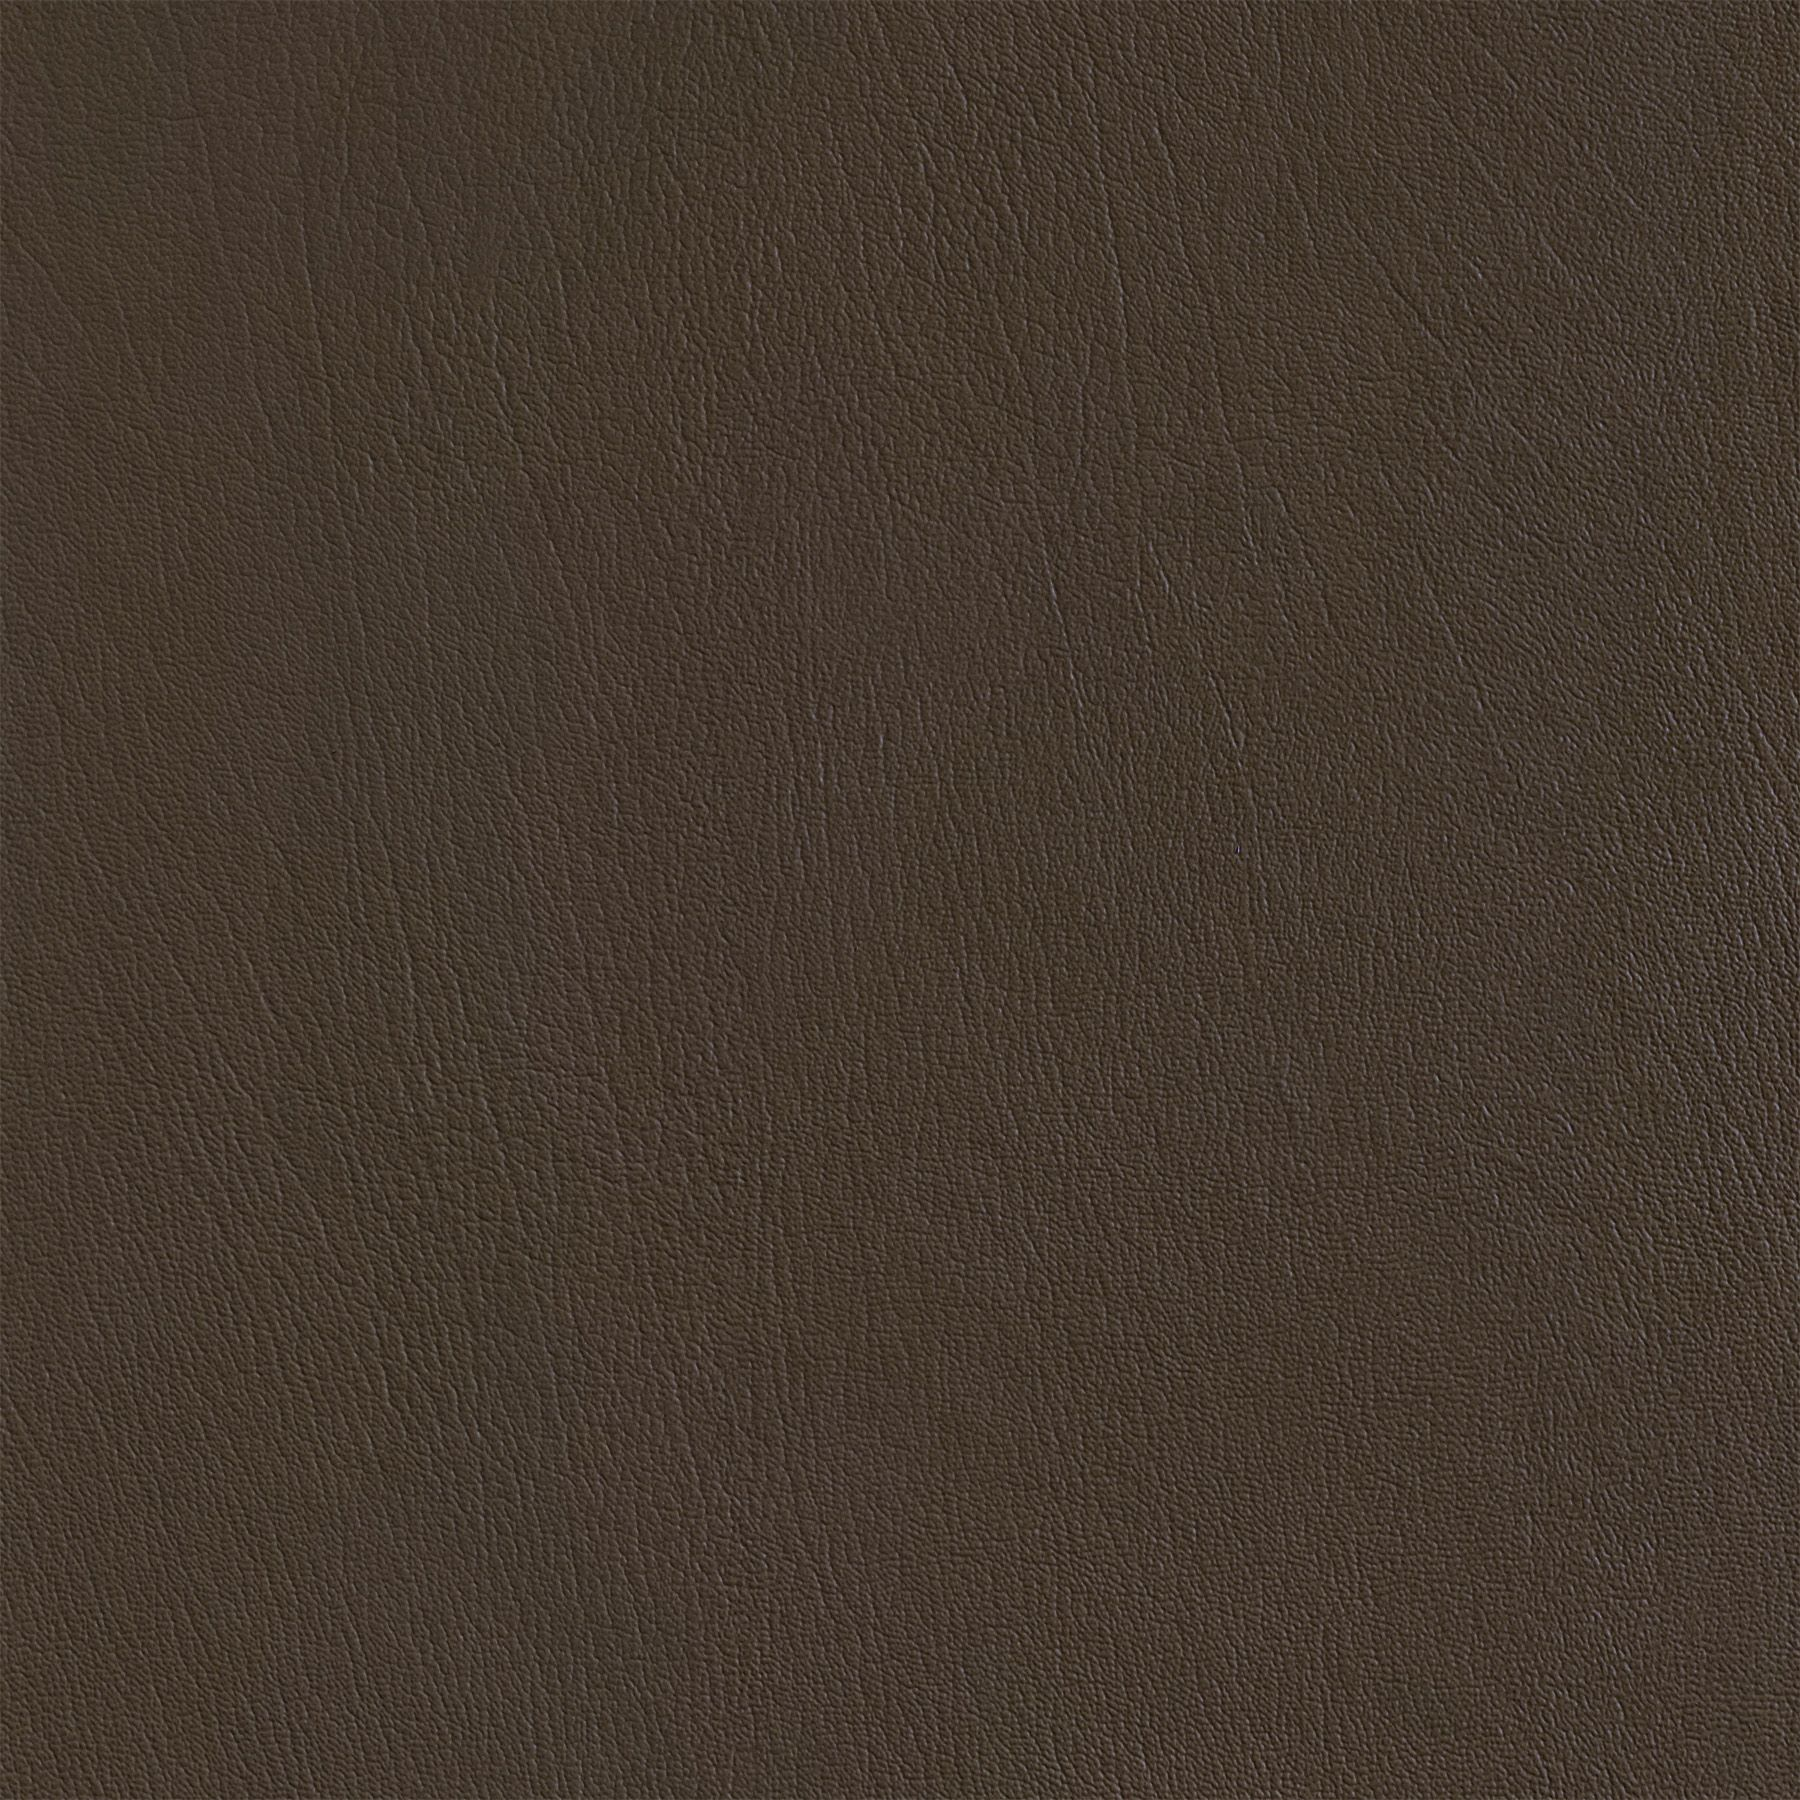 Colorguard Fudge 517922 Boltaflex Omnova Faux Leather Upholstery Vinyl Dvcfabric Com Vinyl Fabric Leather Upholstery Vinyl